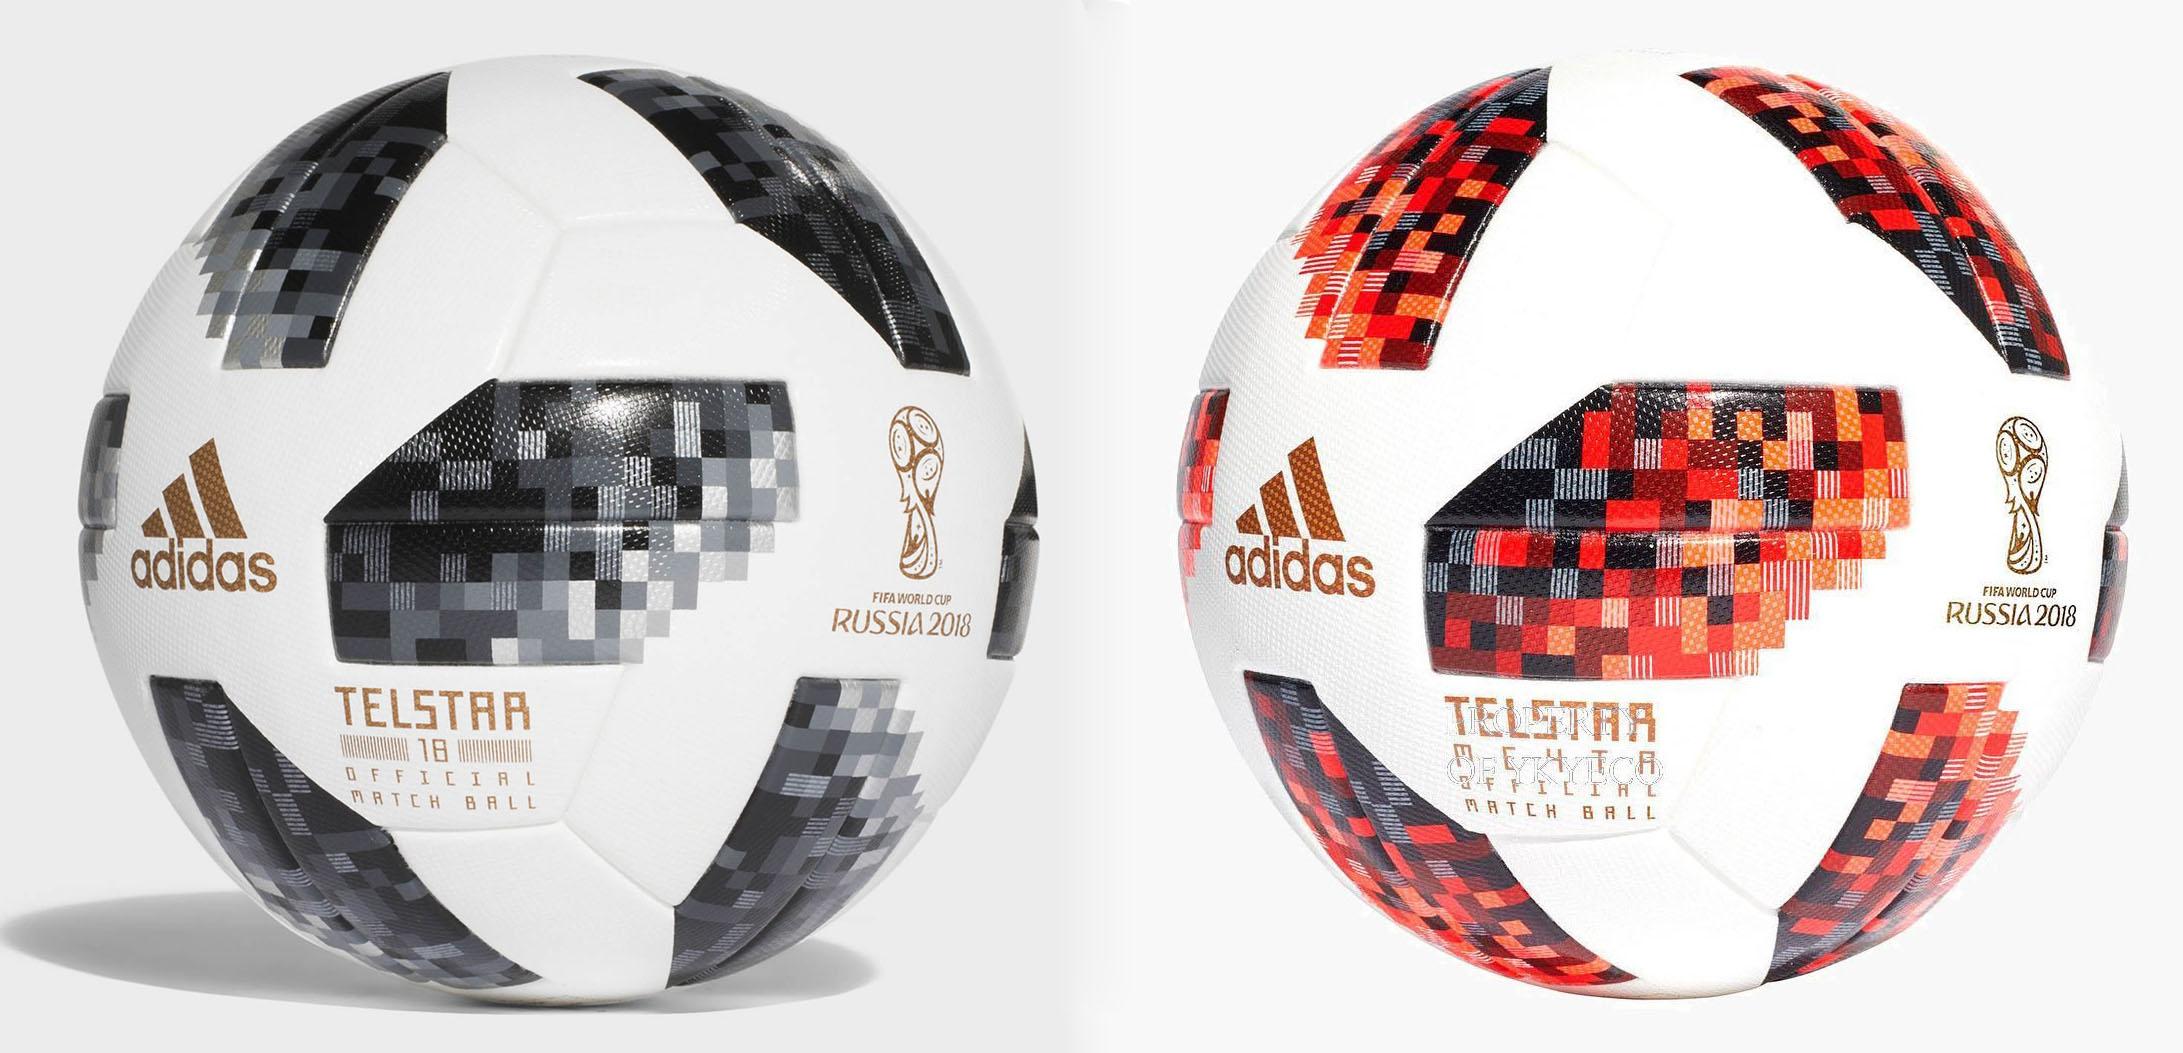 Мячи adidas telstar